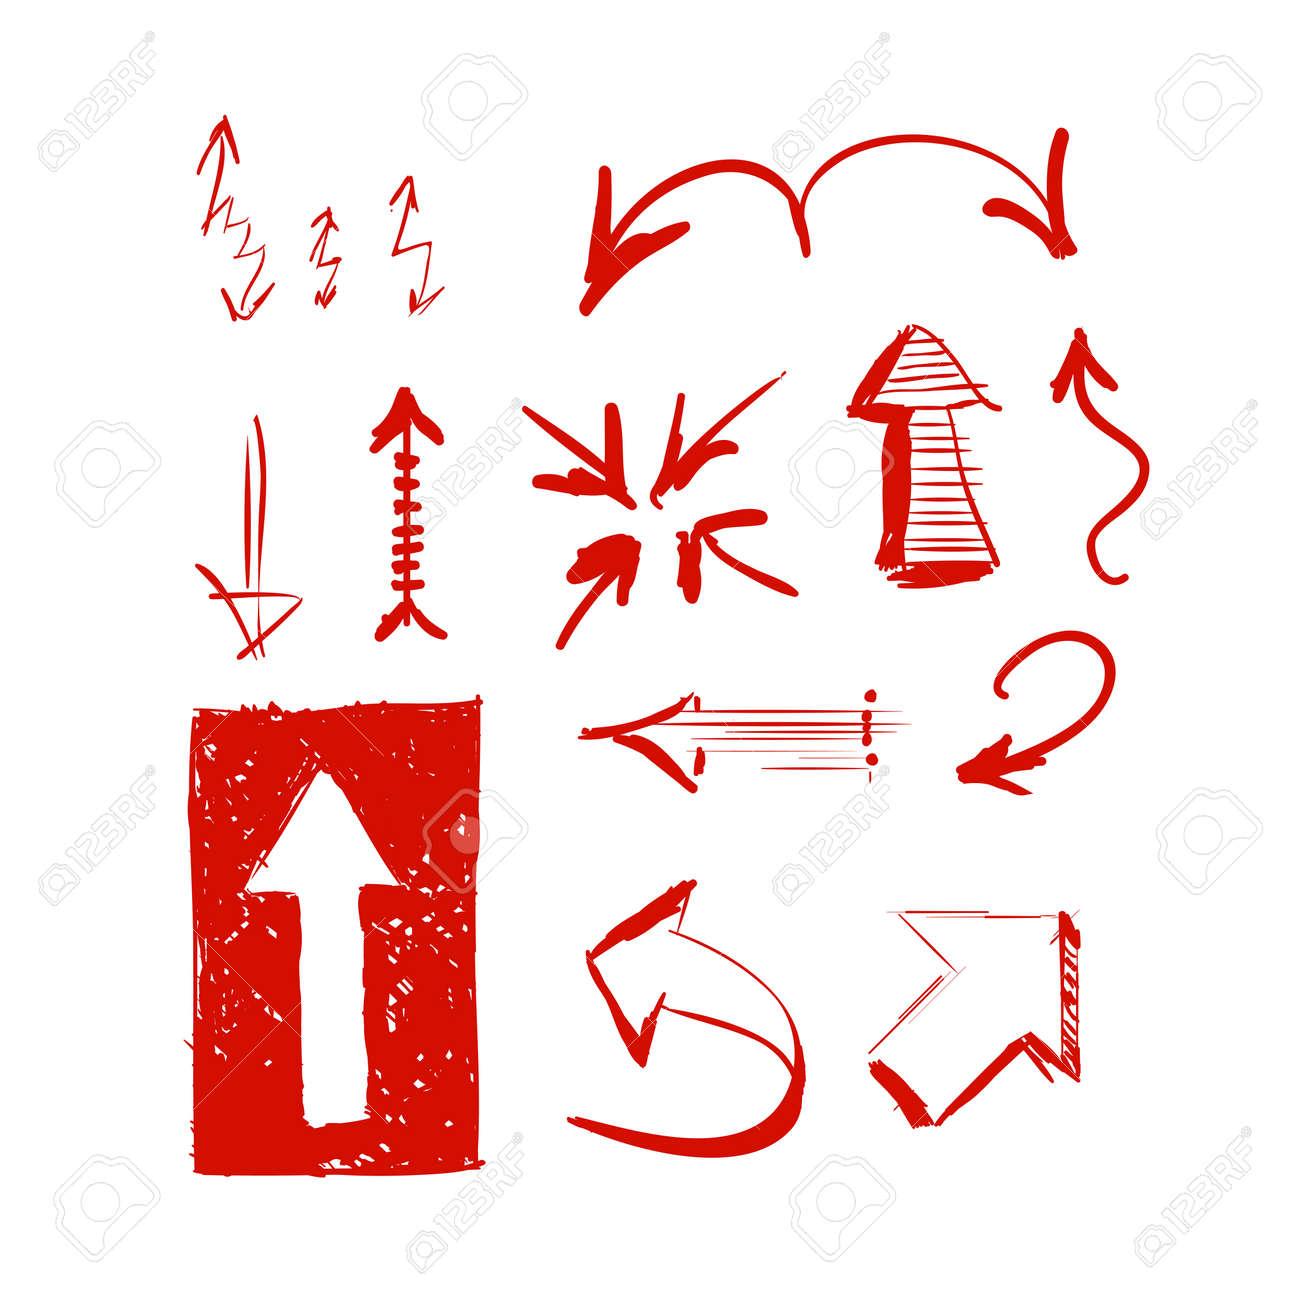 hand drawn highlighter elements vector arrows royalty free cliparts rh 123rf com vector arrows free vector arrows free download